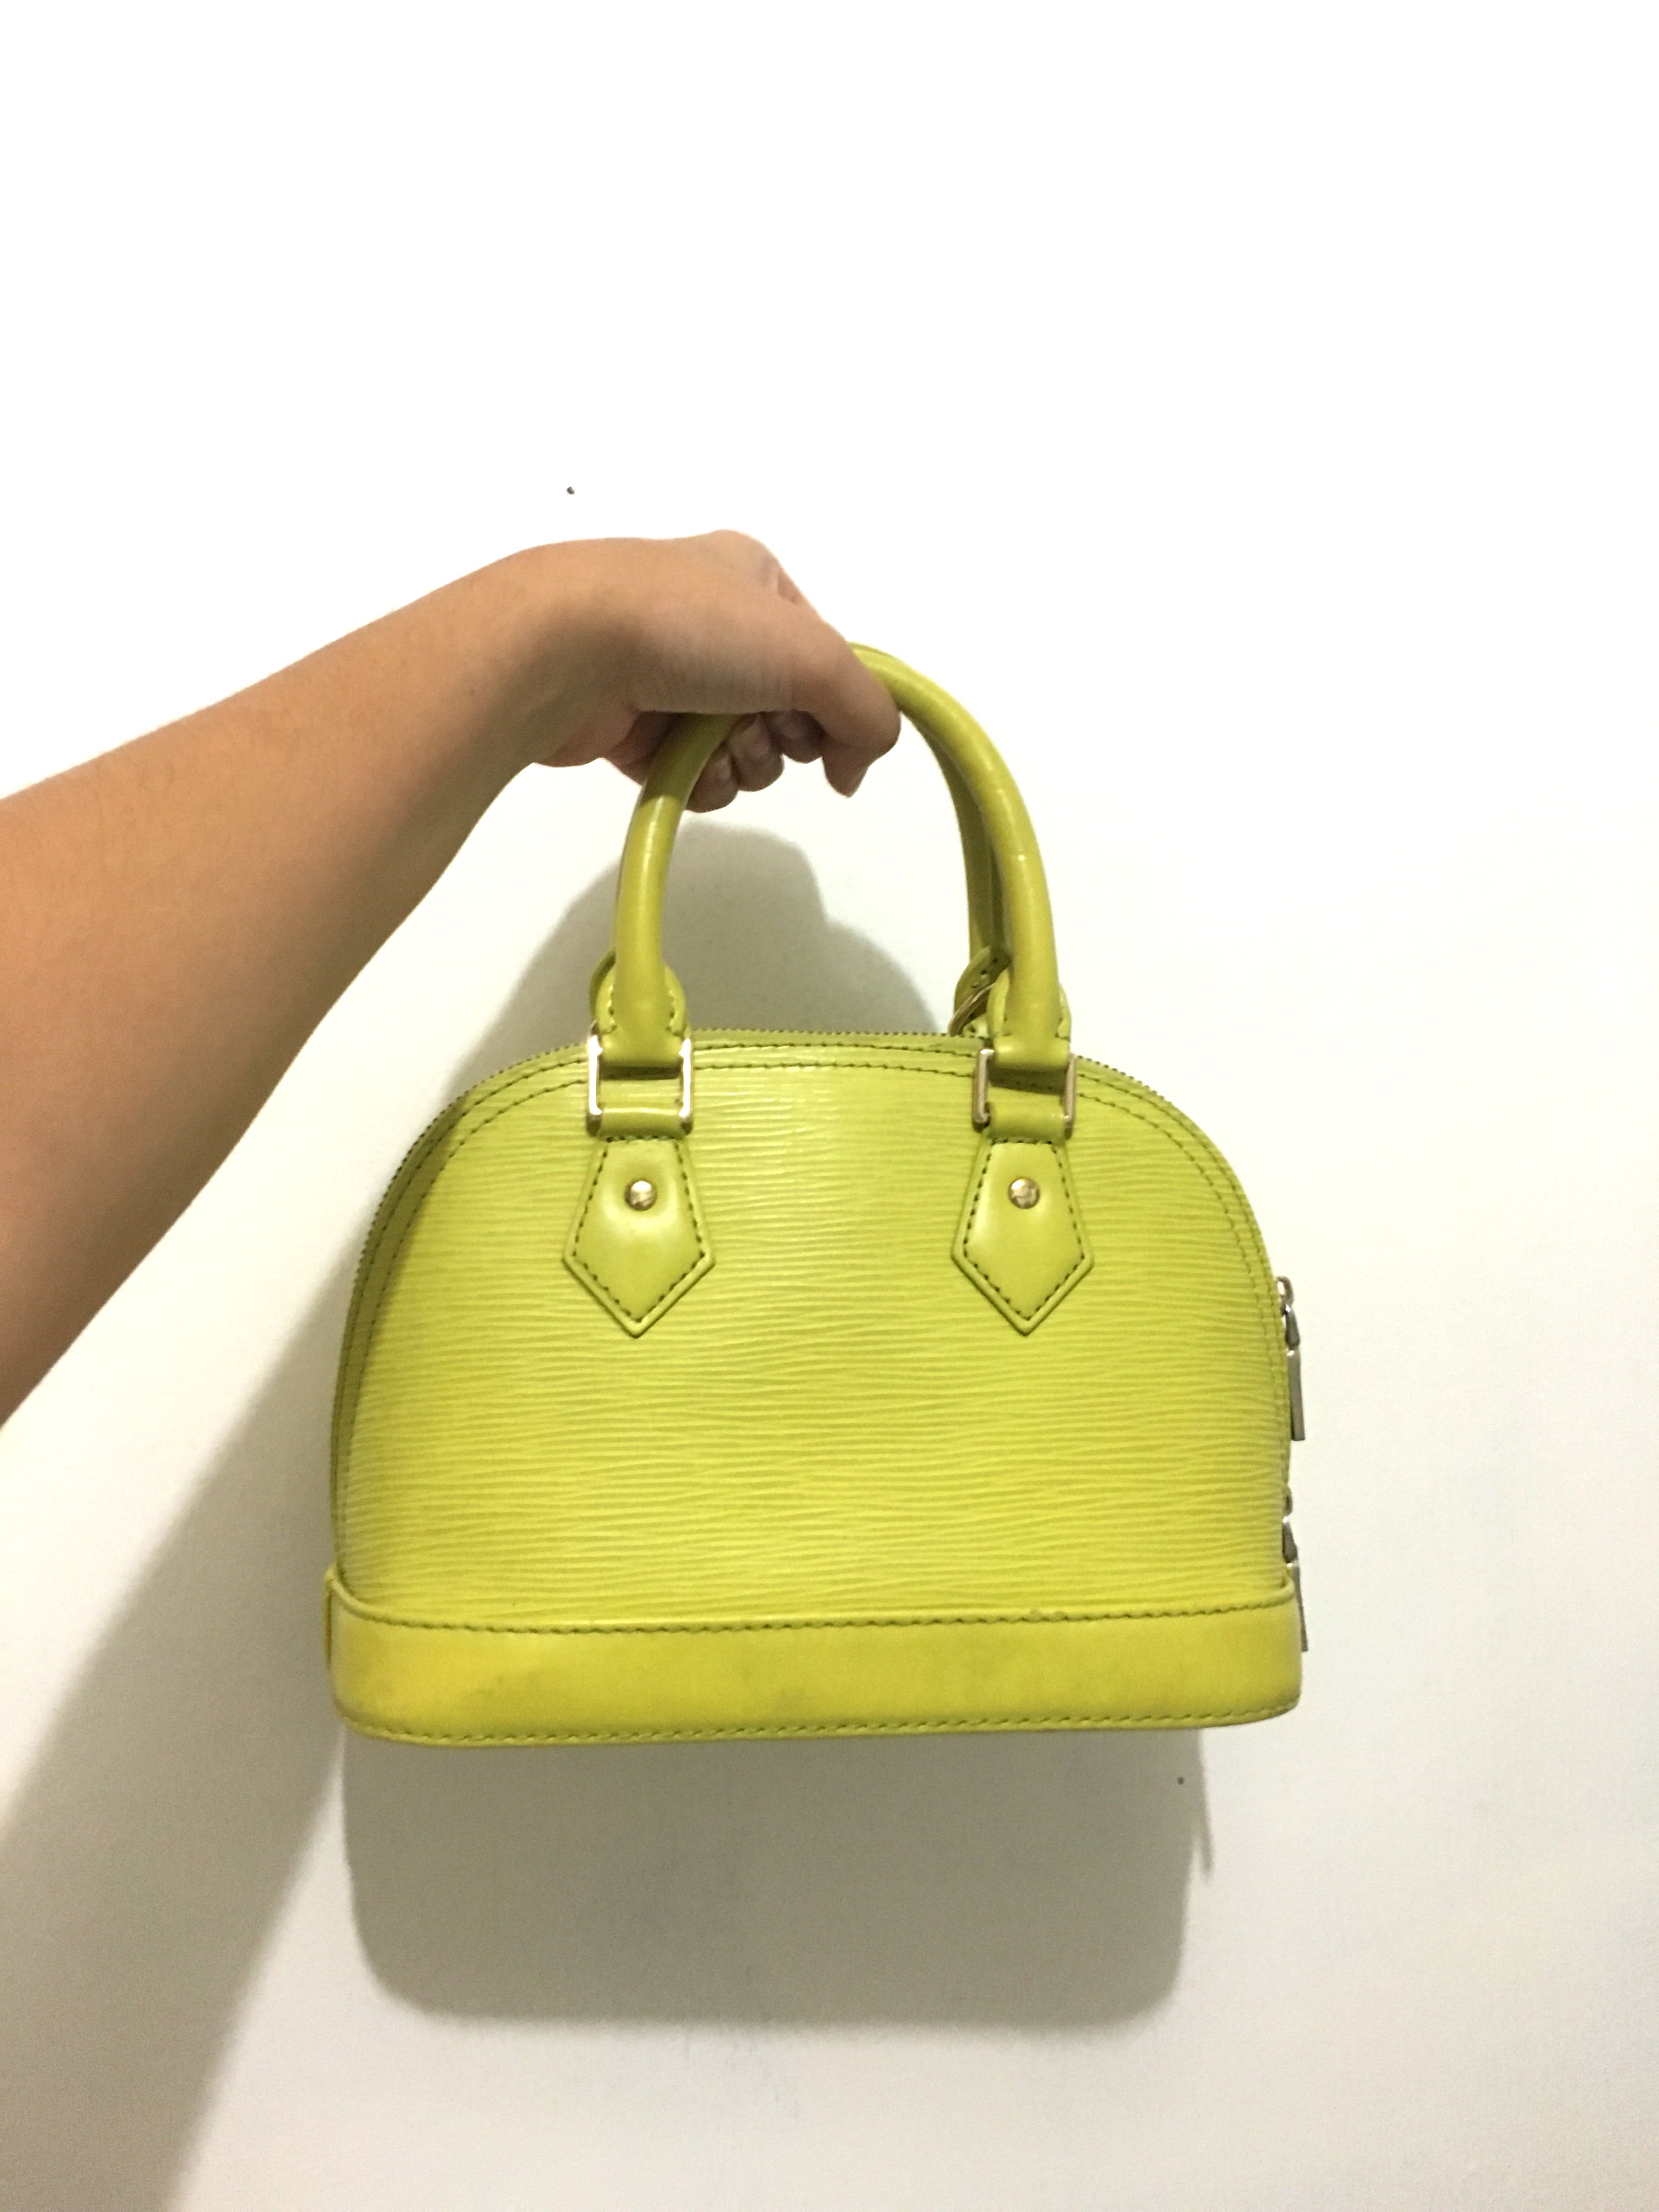 66576b30f5 Lime green mini bag (LV bb alma inspired)